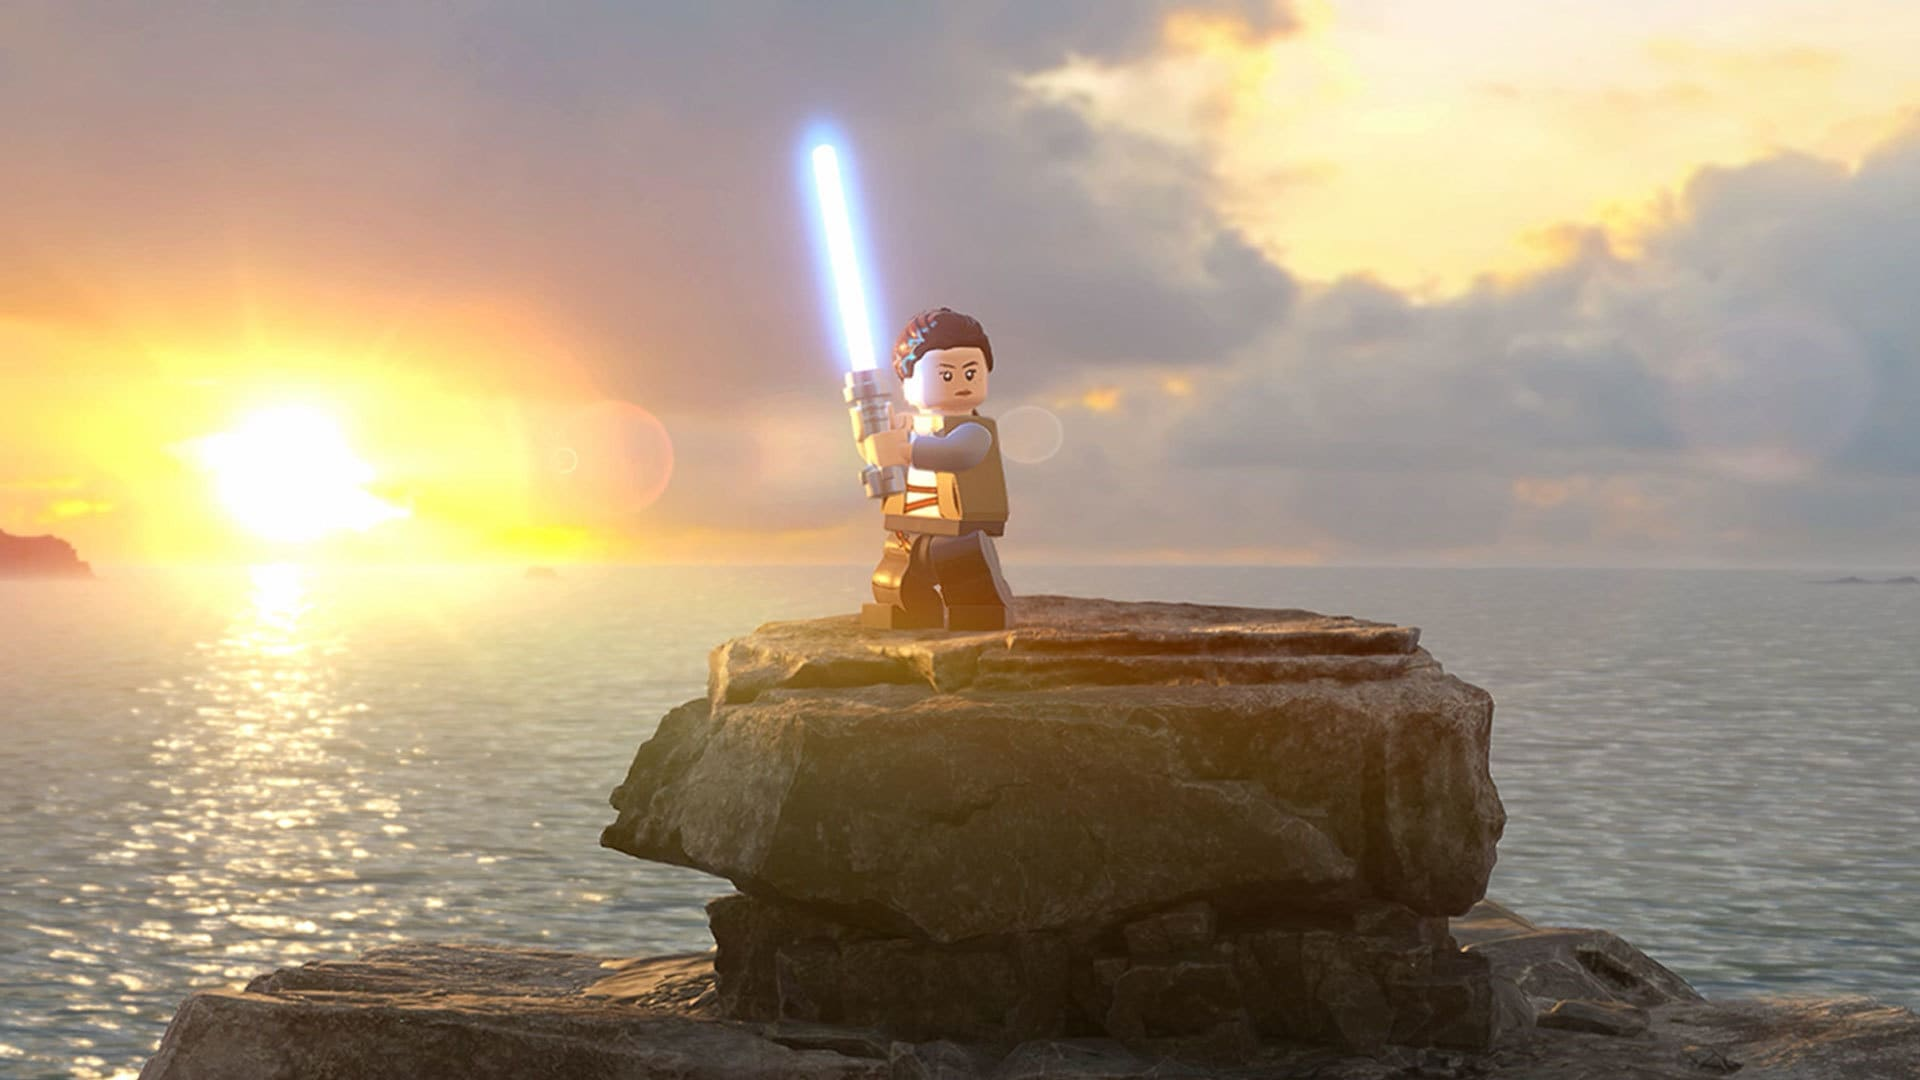 Official Gameplay Trailer 2 | LEGO Star Wars: The Skywalker Saga